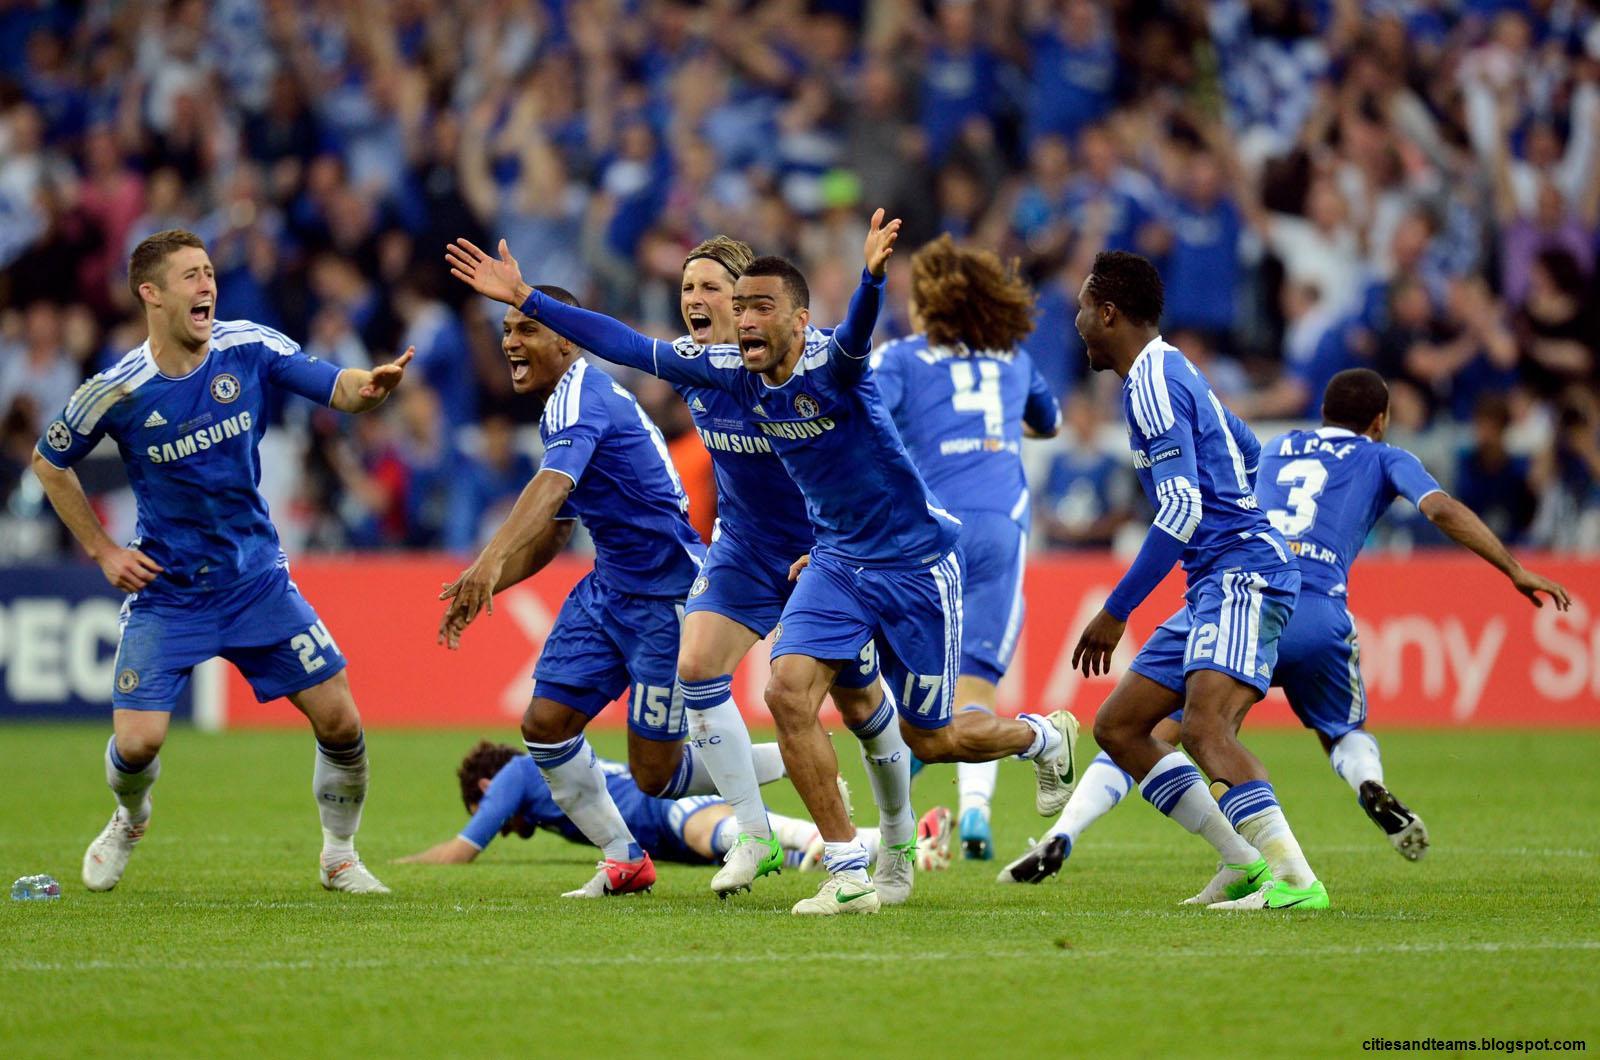 2012 Uefa Champions League Champion Is Chelsea ~ C.a.T